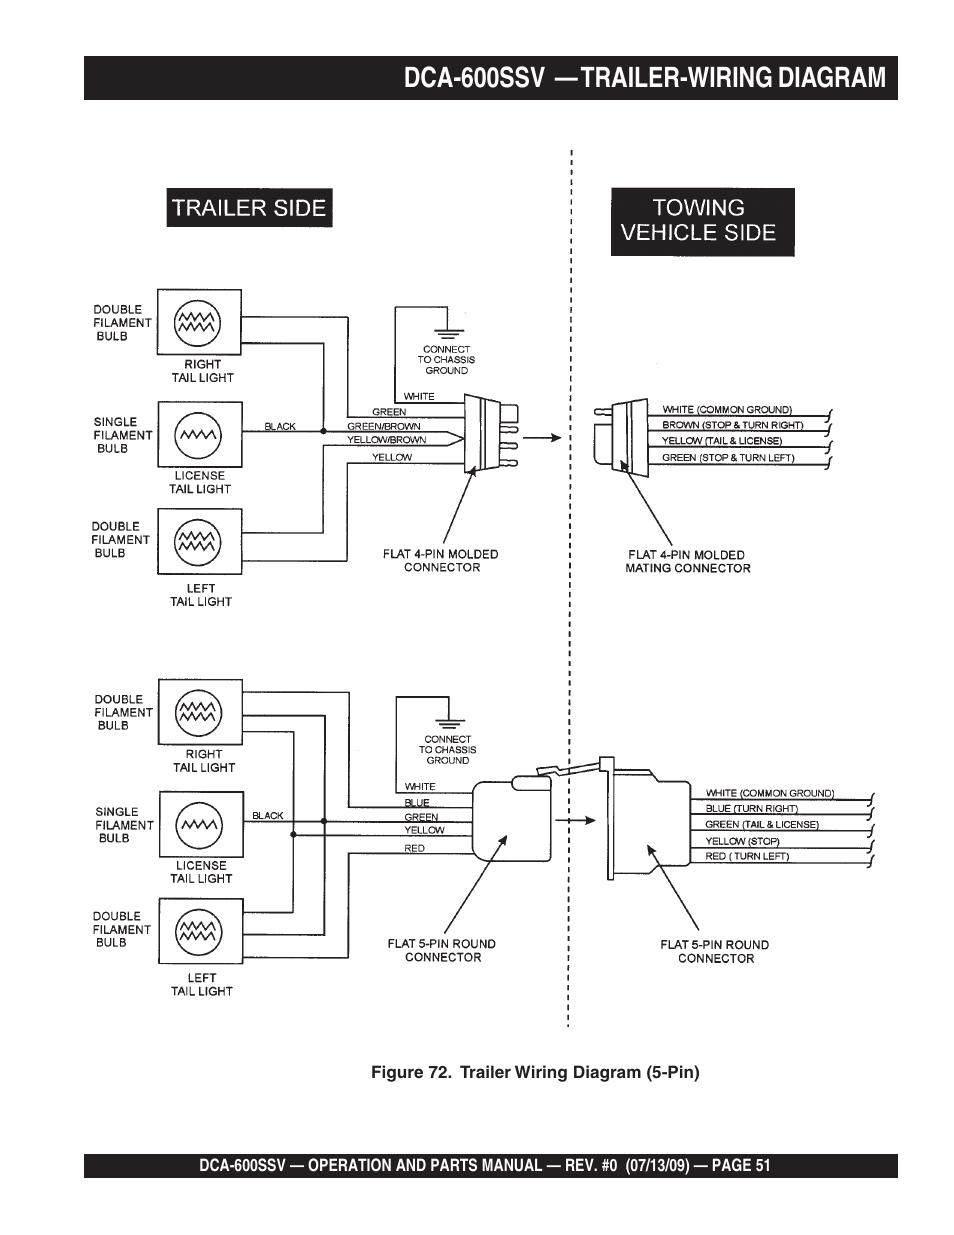 medium resolution of ssv wiring diagram wiring diagramssv wiring diagram wiring librarydca 600ssv u2014 trailer wiring diagram